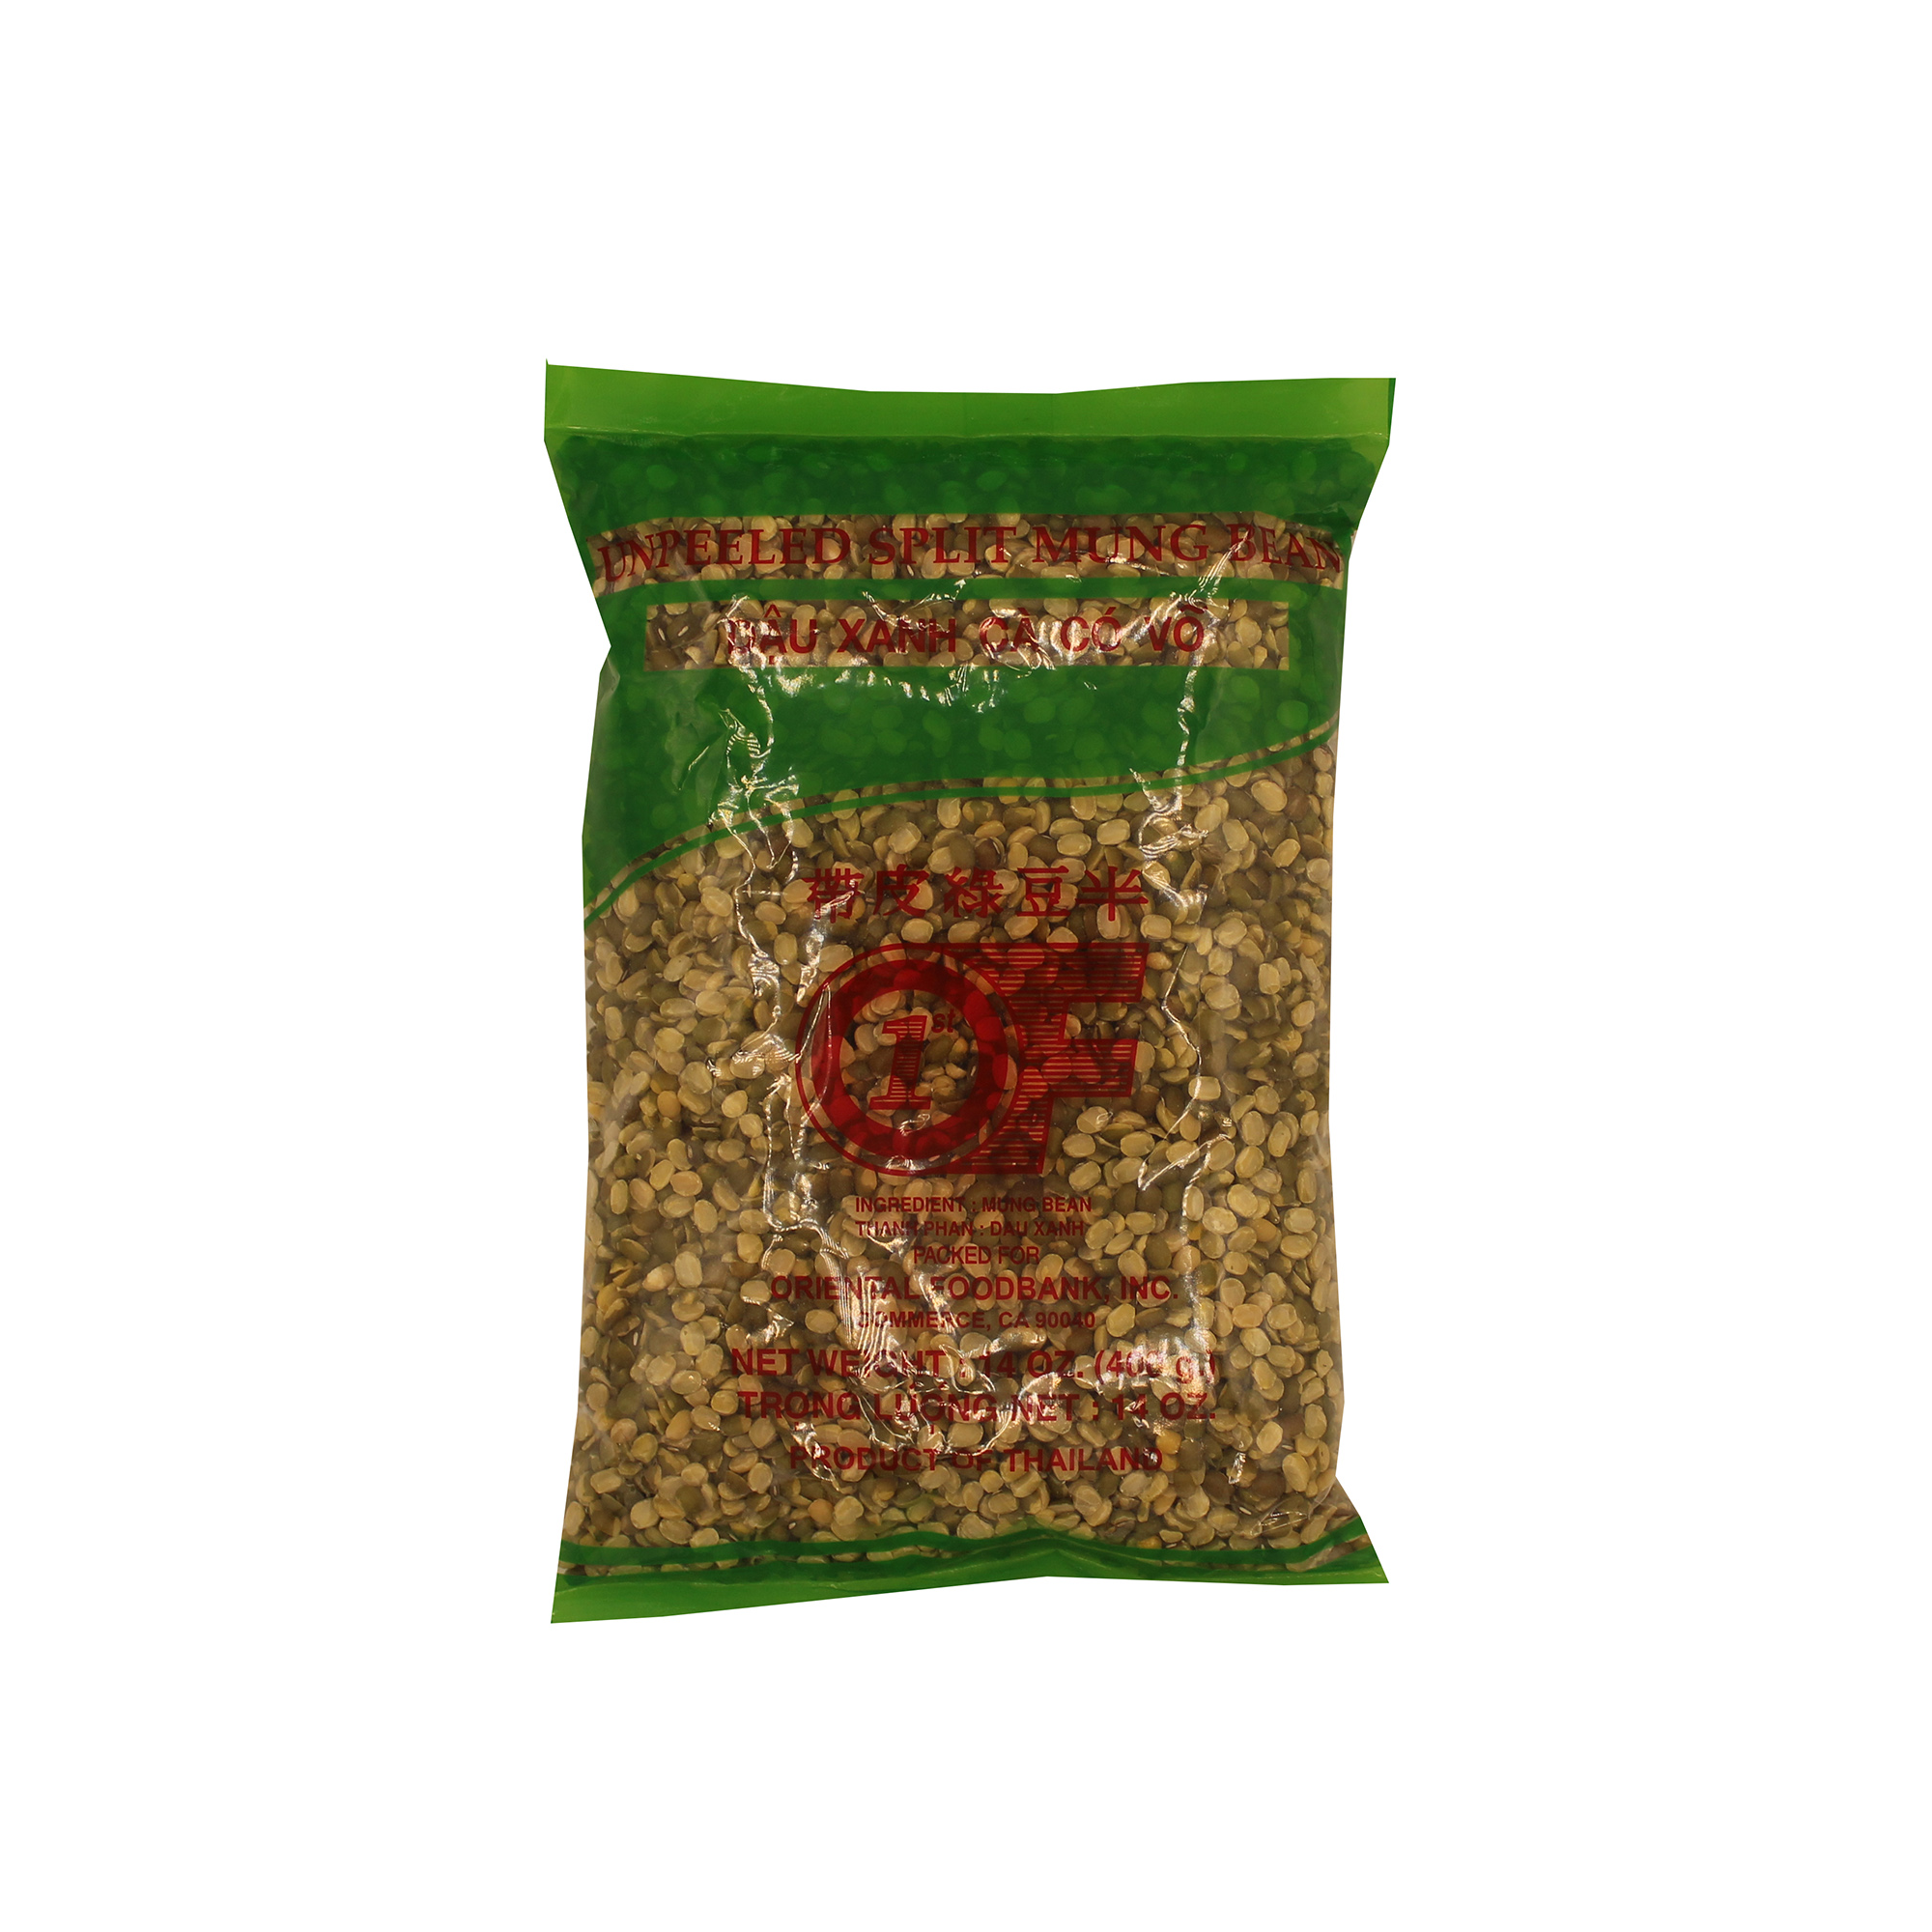 medium 1st of unpeeled split mung bean 14oz mOpO Ut Q